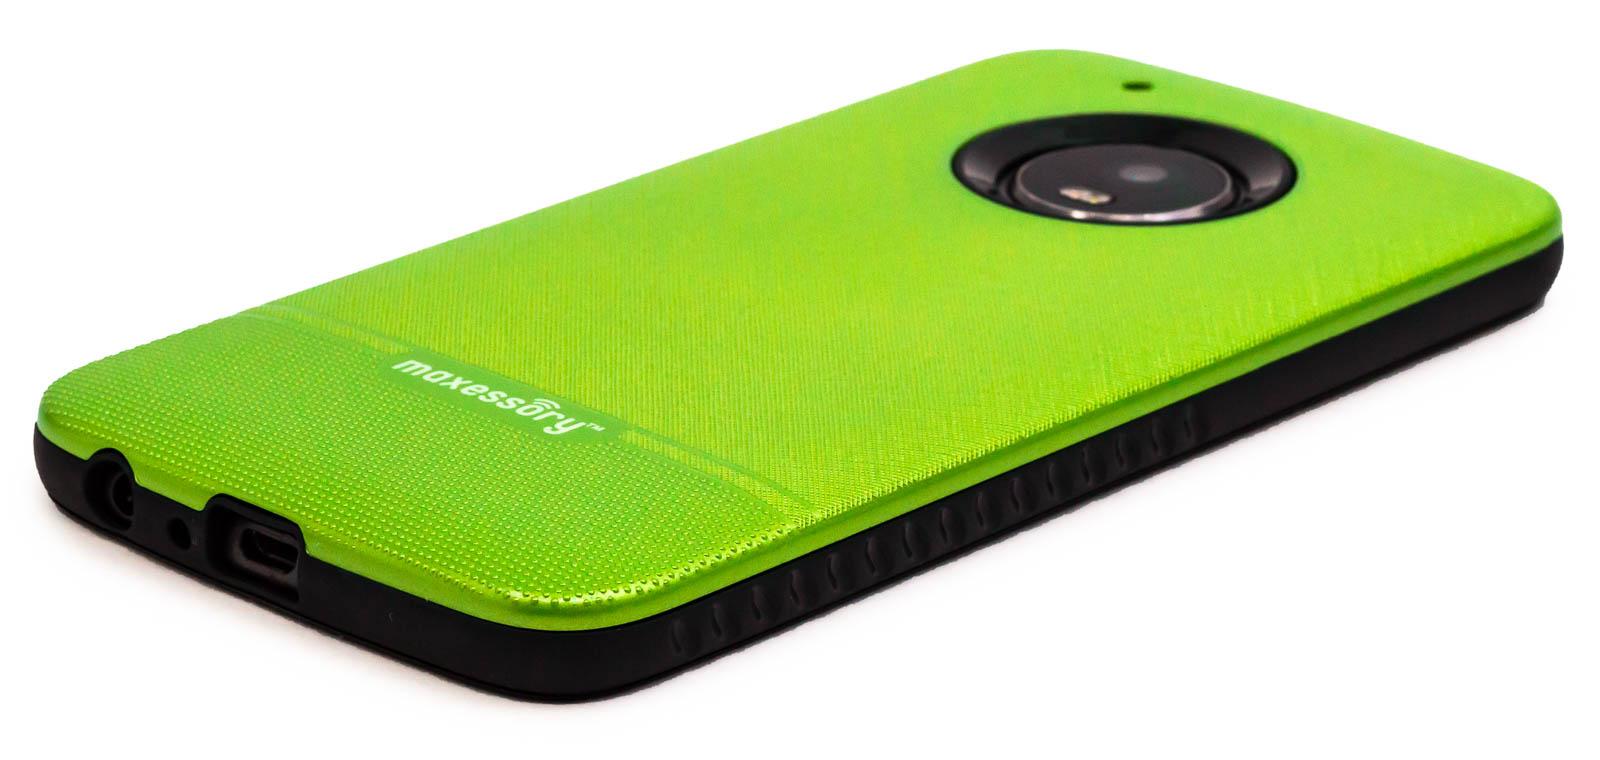 Moto-G5-Plus-Case-Moto-X-17-Case-Ultra-Thin-Hard-Body-Tactile-Shell-Cover thumbnail 20